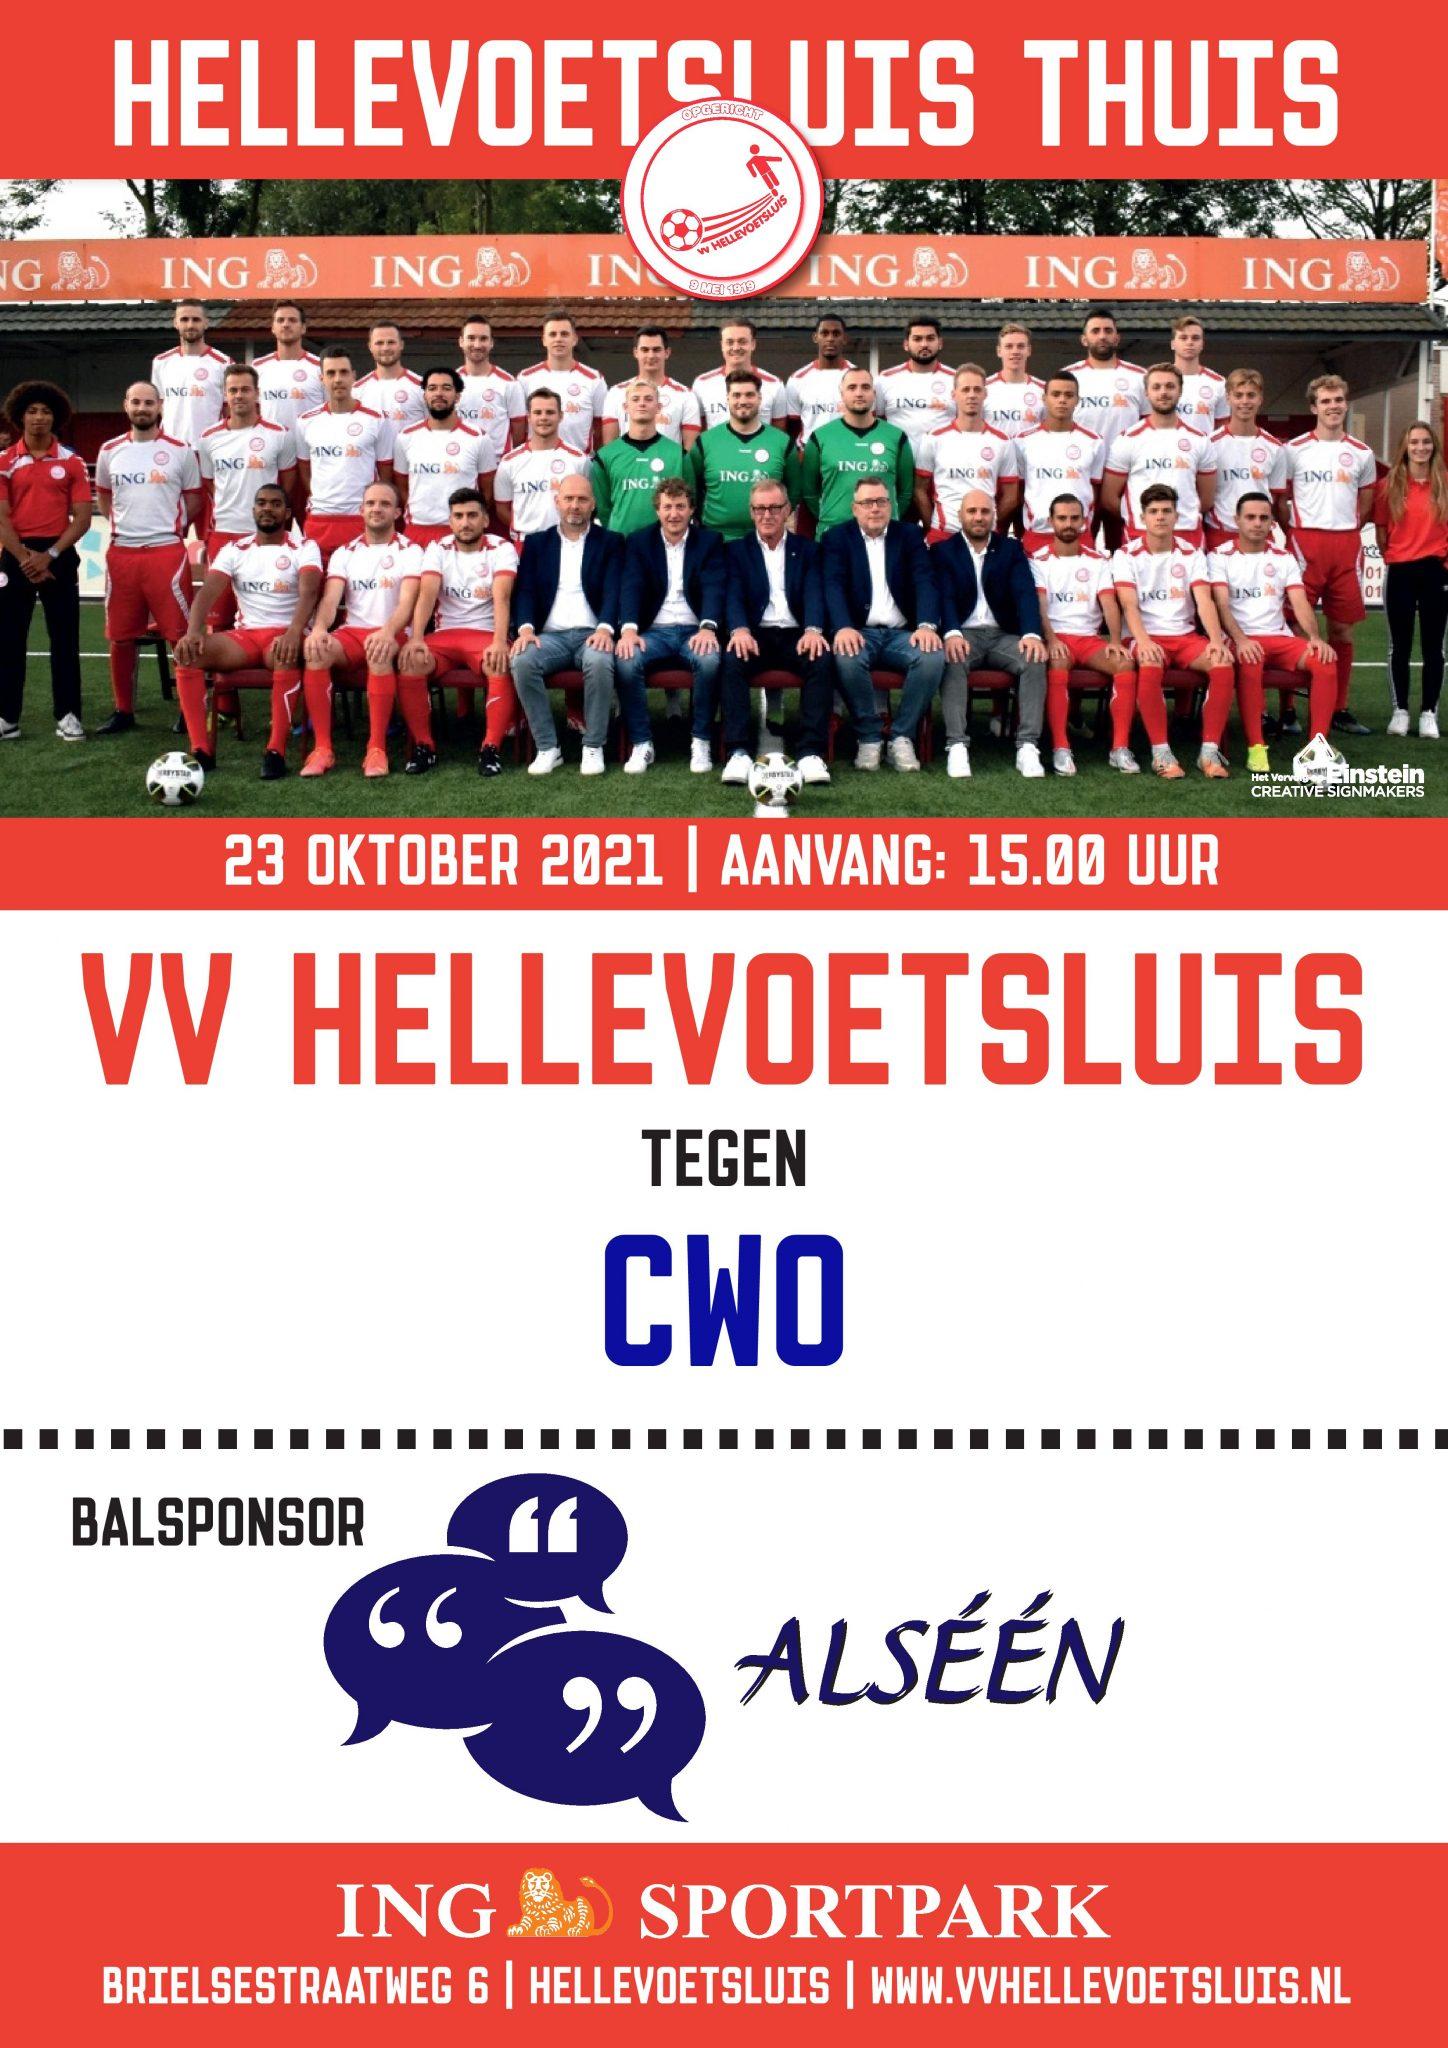 Zaterdag 23 oktober, aanvang 15.00 uur: Hellevoetsluis - CWO